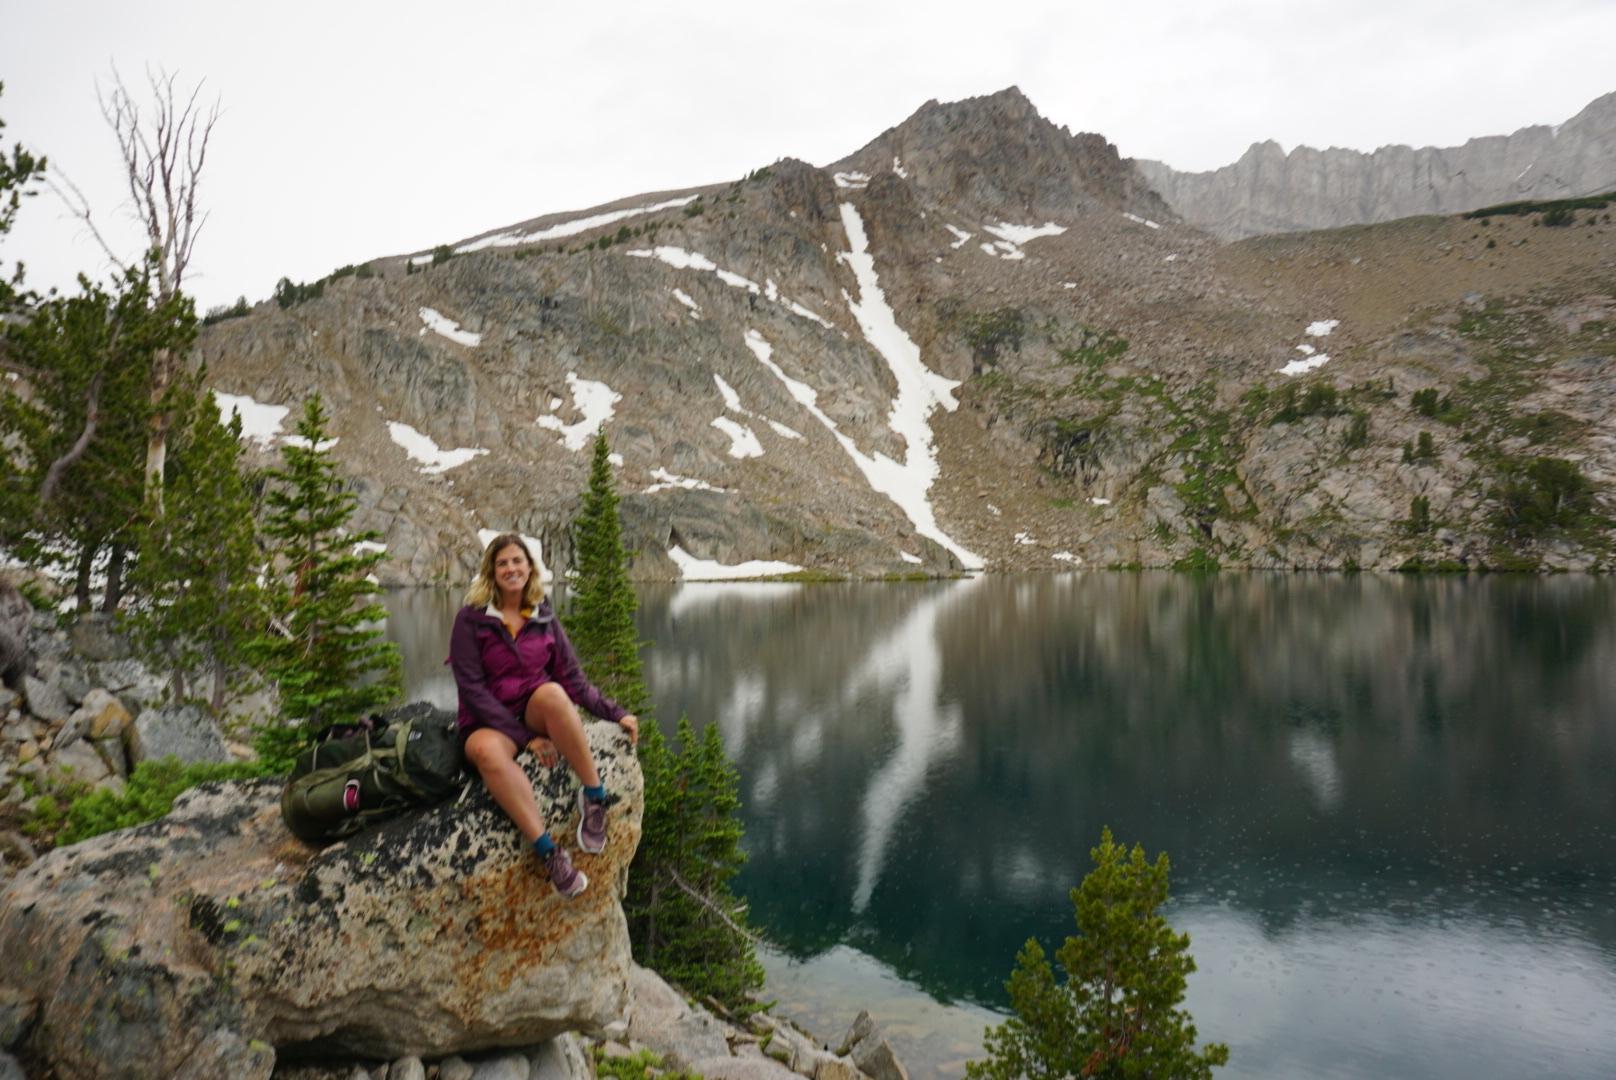 Taking a break while hiking the Big Boulder Lakes